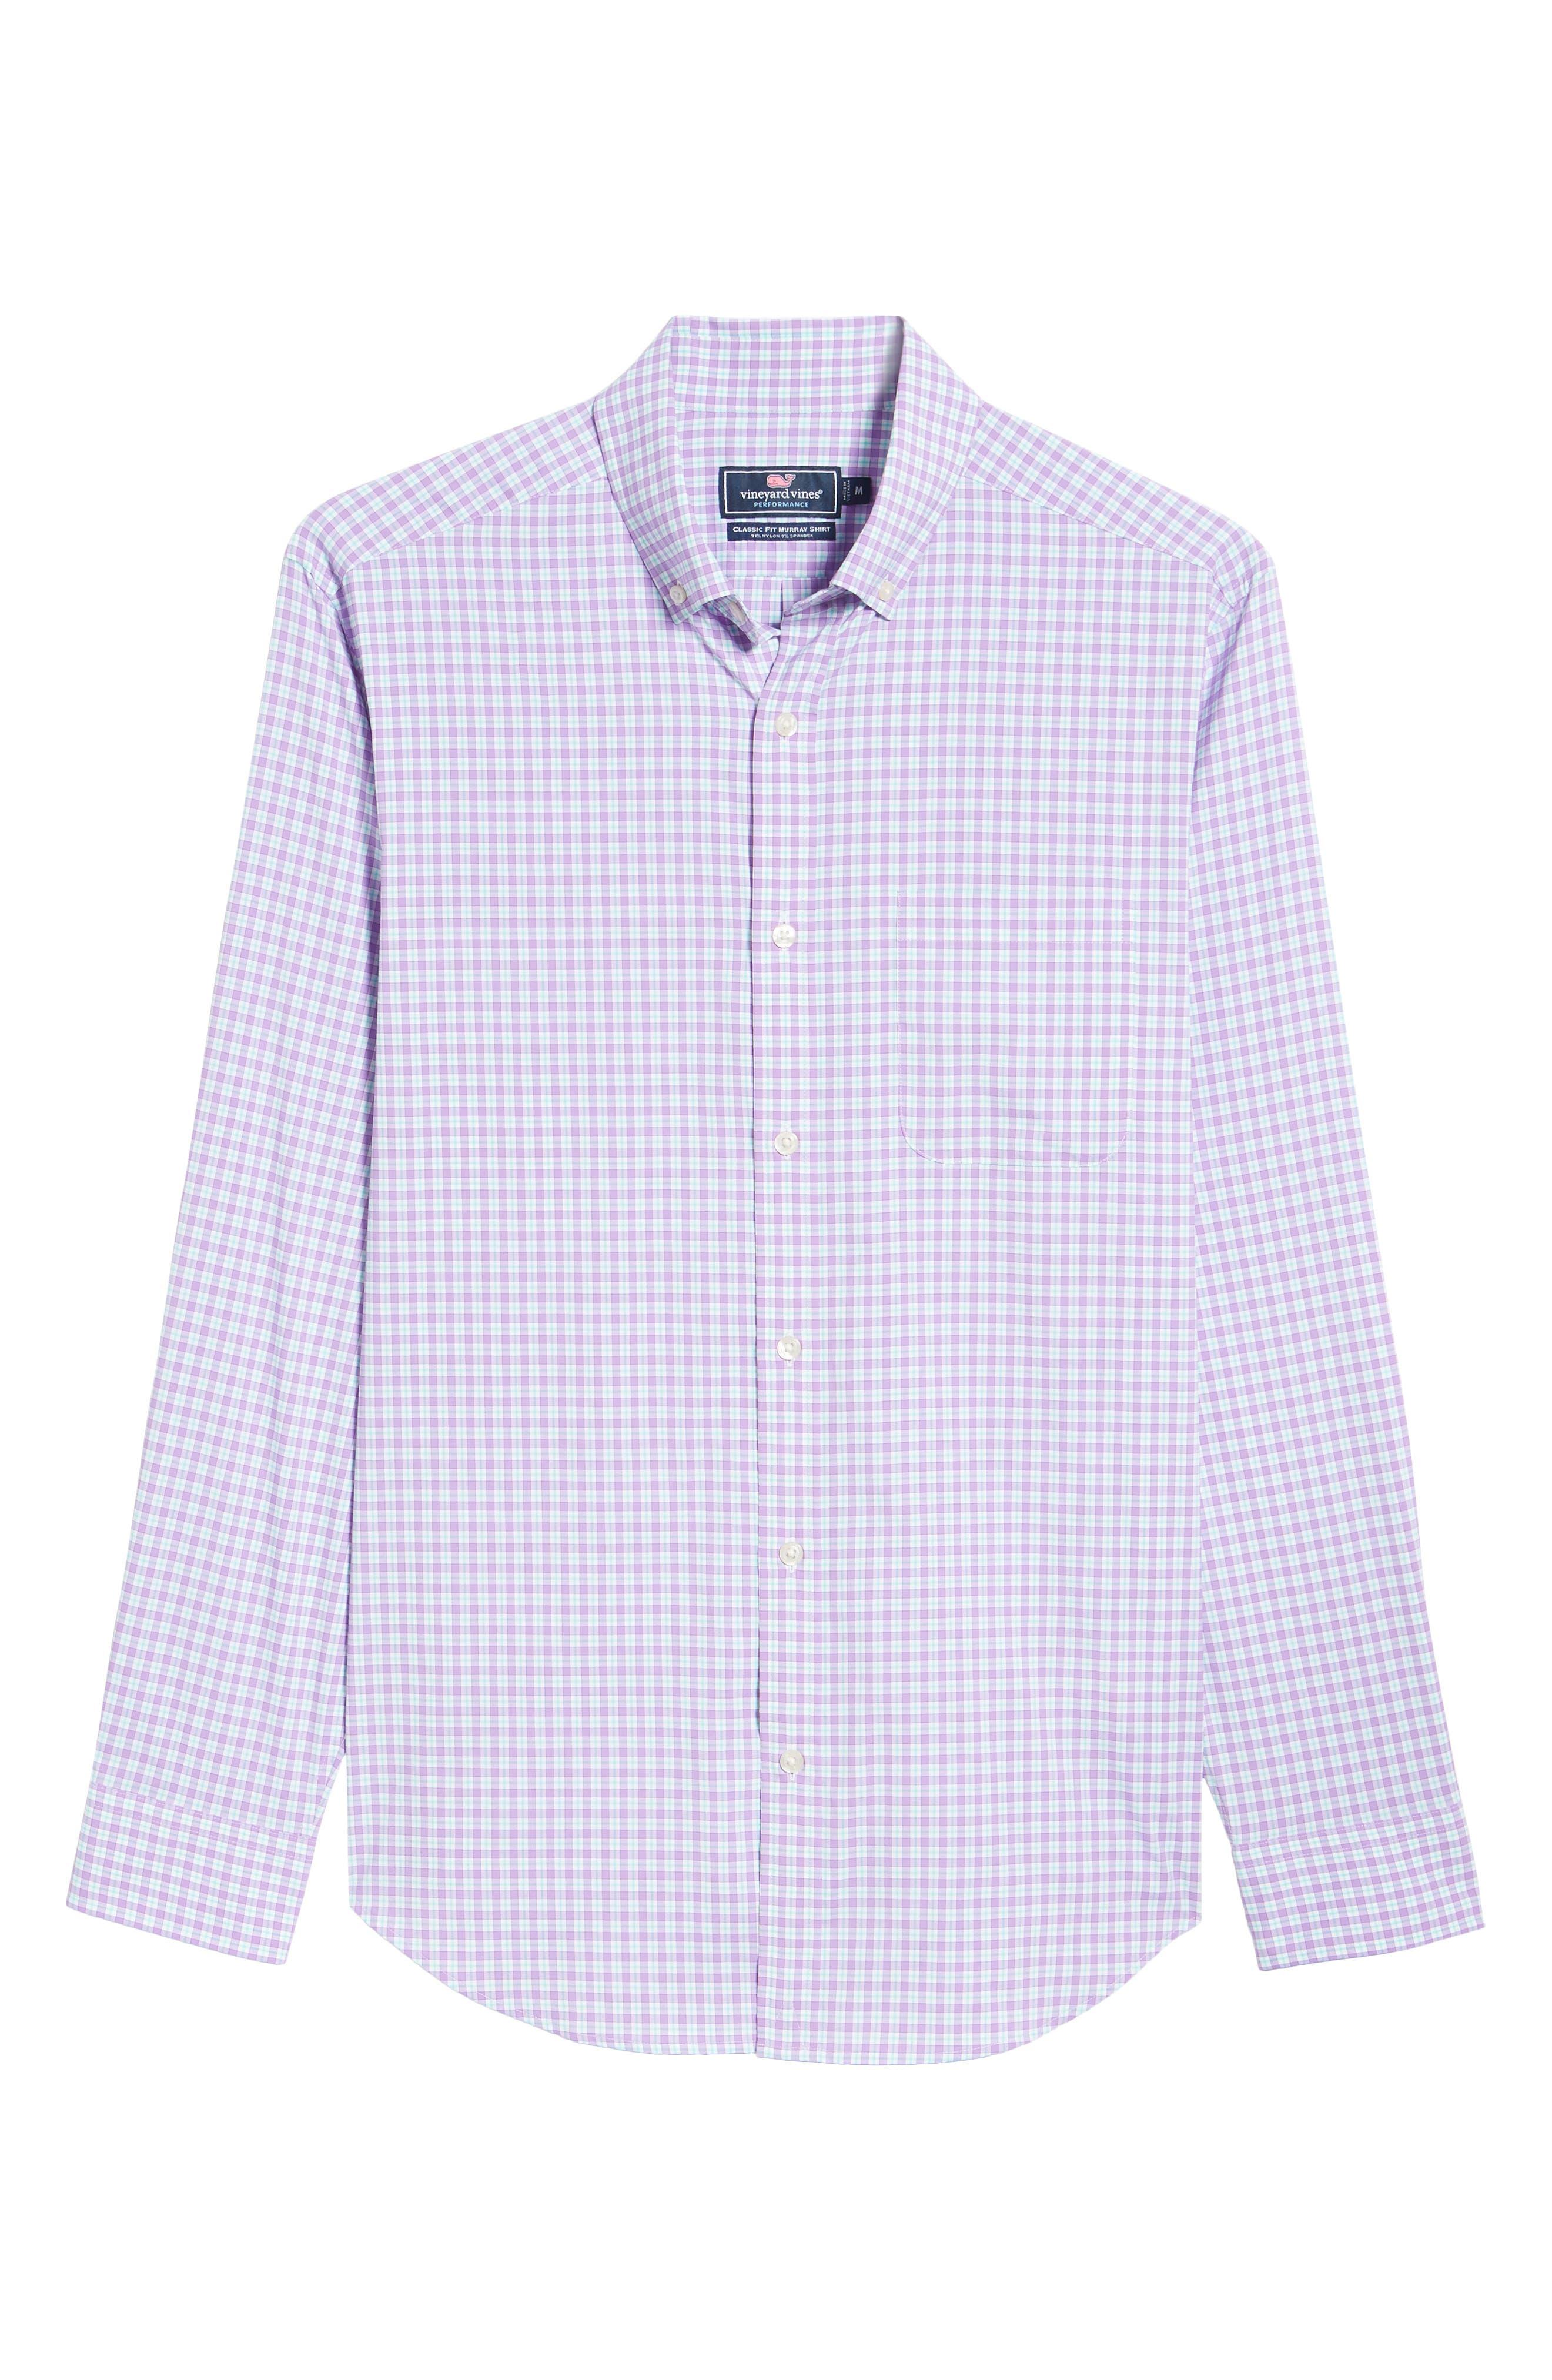 Oyster Pond Slim Fit Plaid Sport Shirt,                             Alternate thumbnail 6, color,                             Sea Urchin